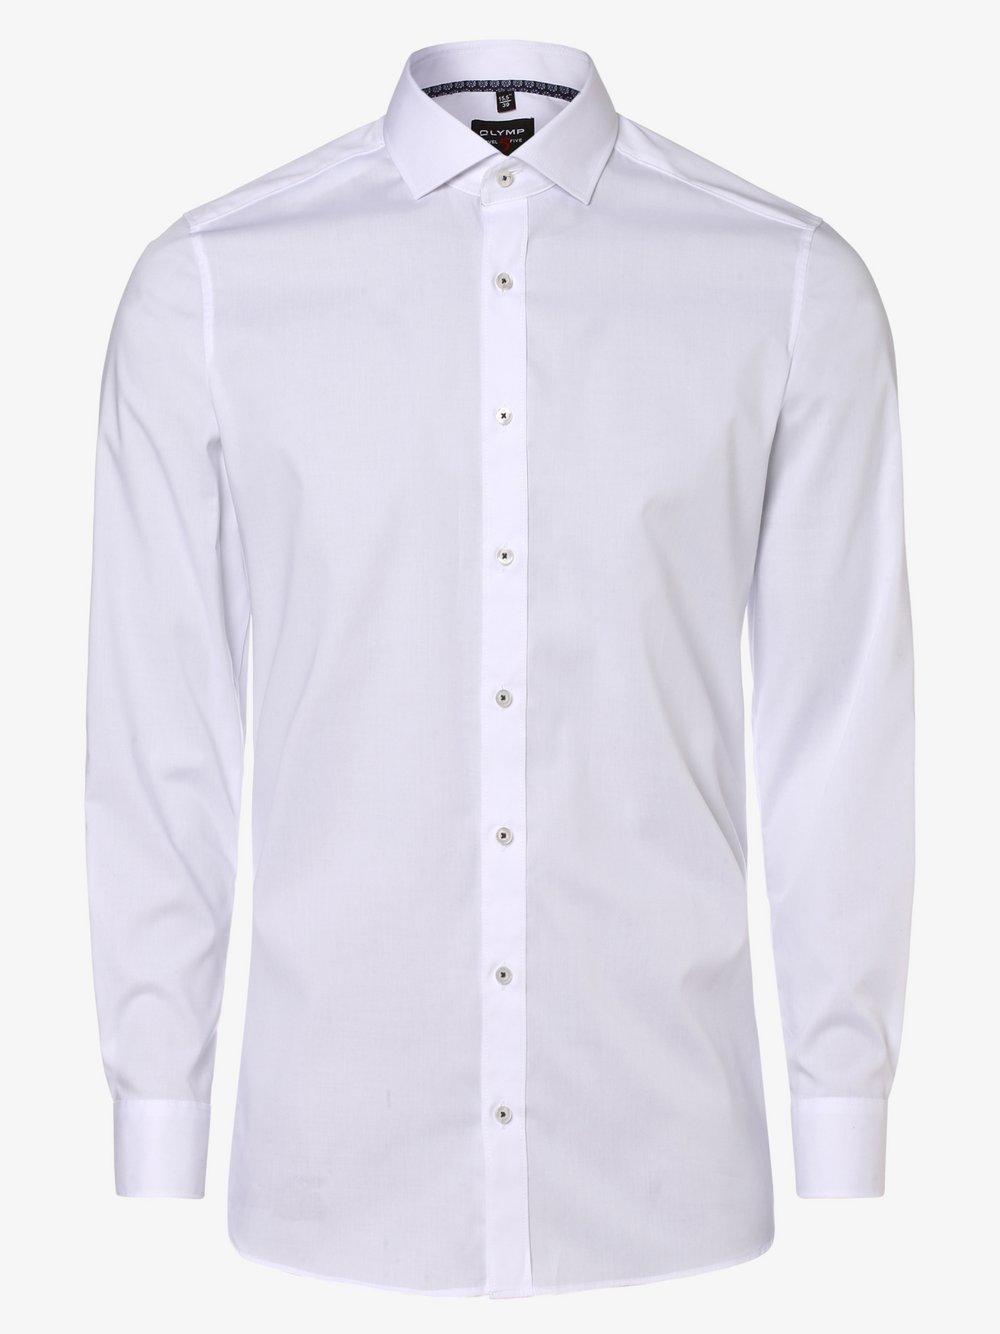 Olymp Level Five – Koszula męska łatwa w prasowaniu, biały Van Graaf 449265-0002-00430